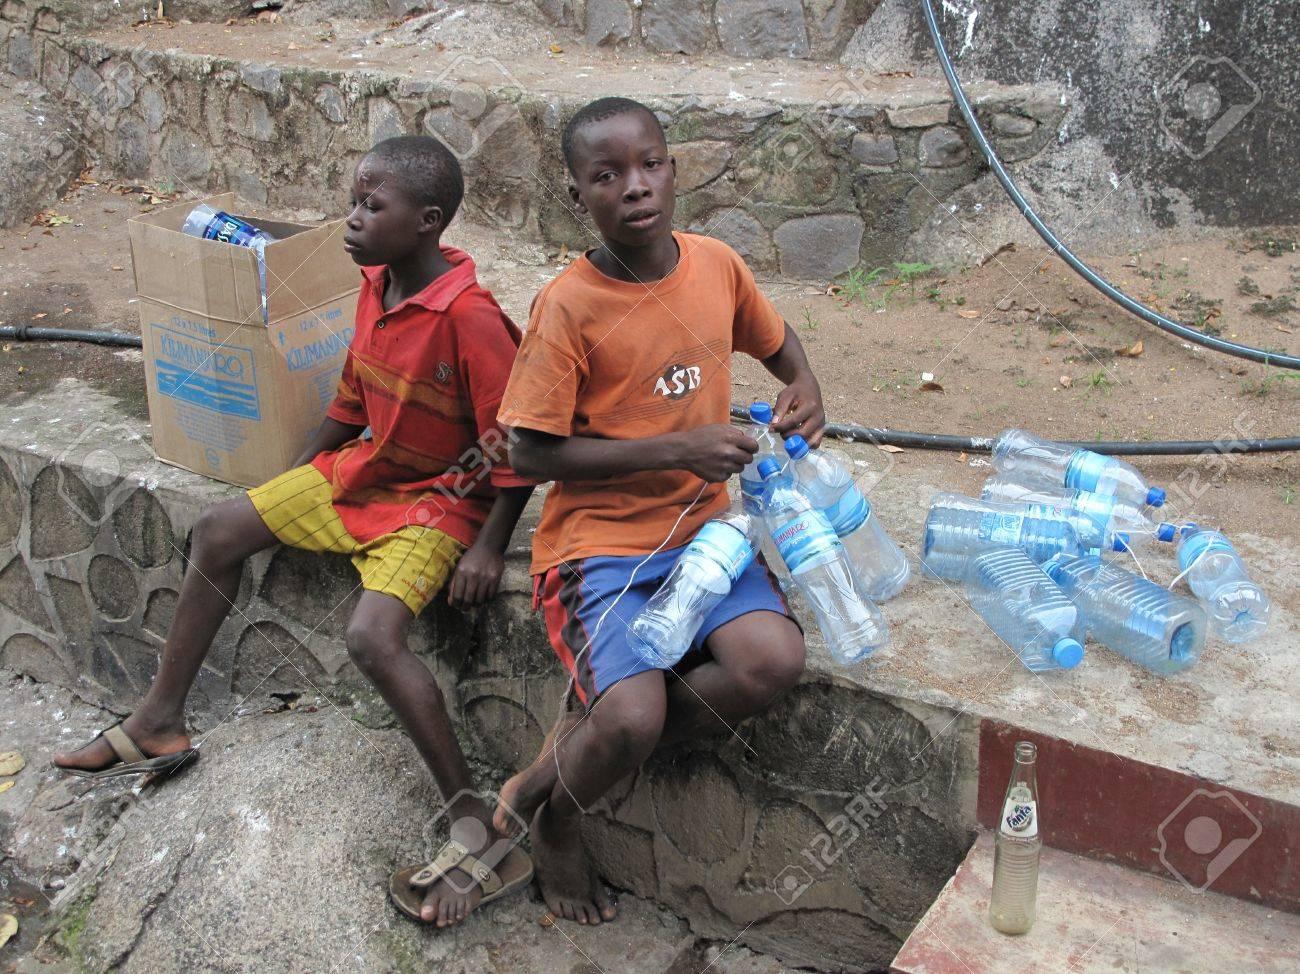 Mwanza,Tanzania,March,14,2010 : unidentified street children collects plastic bottles to sell them in Mwanza Tanzania March 14, 2010 Stock Photo - 12618638